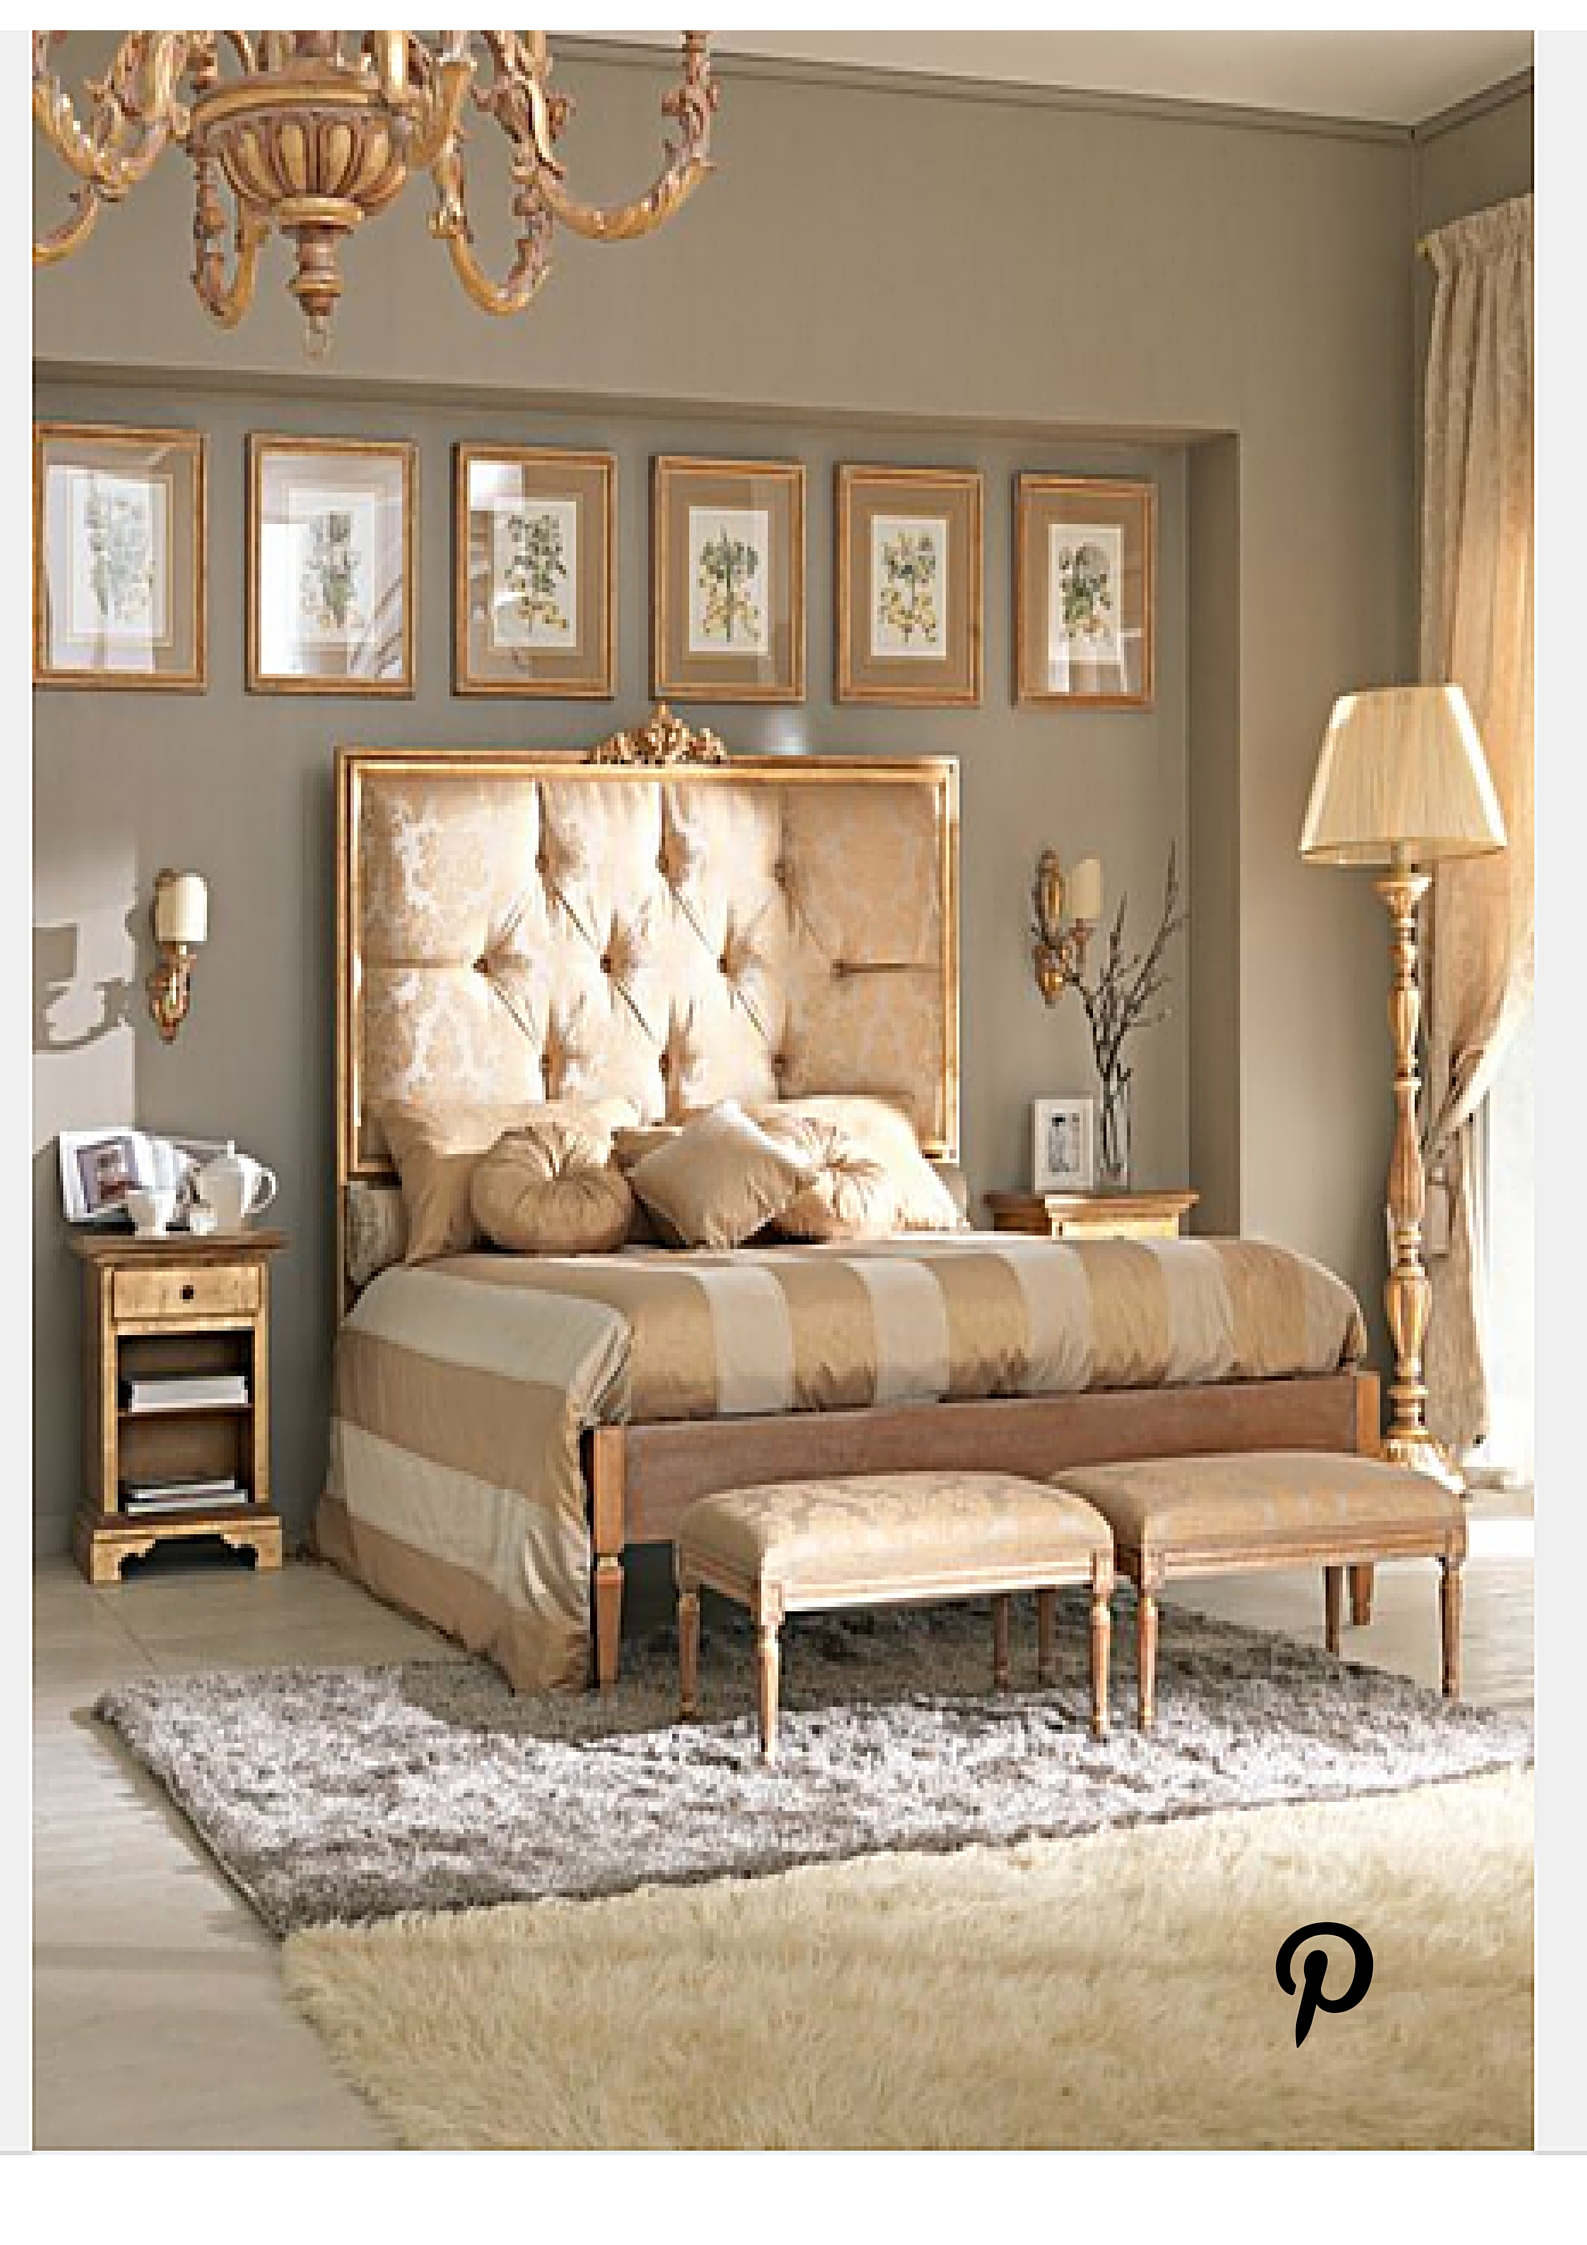 KHB Interiors New Orleans Interior Design Gold Bedroom From Pinterest